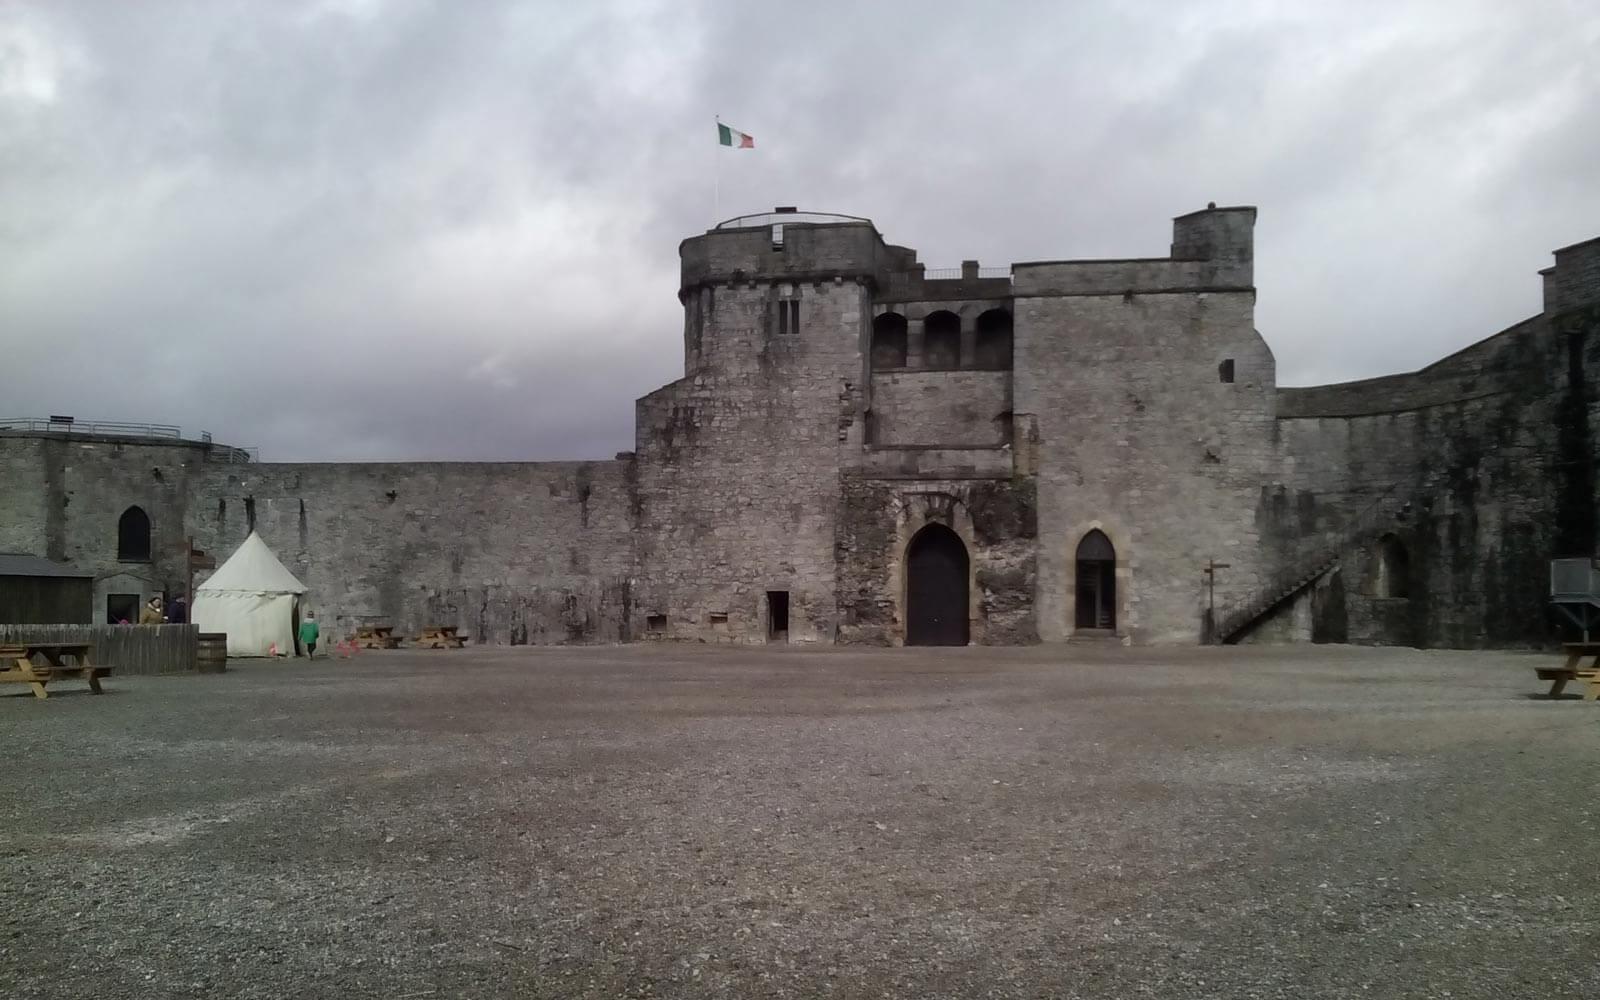 King John's Castle in Irland